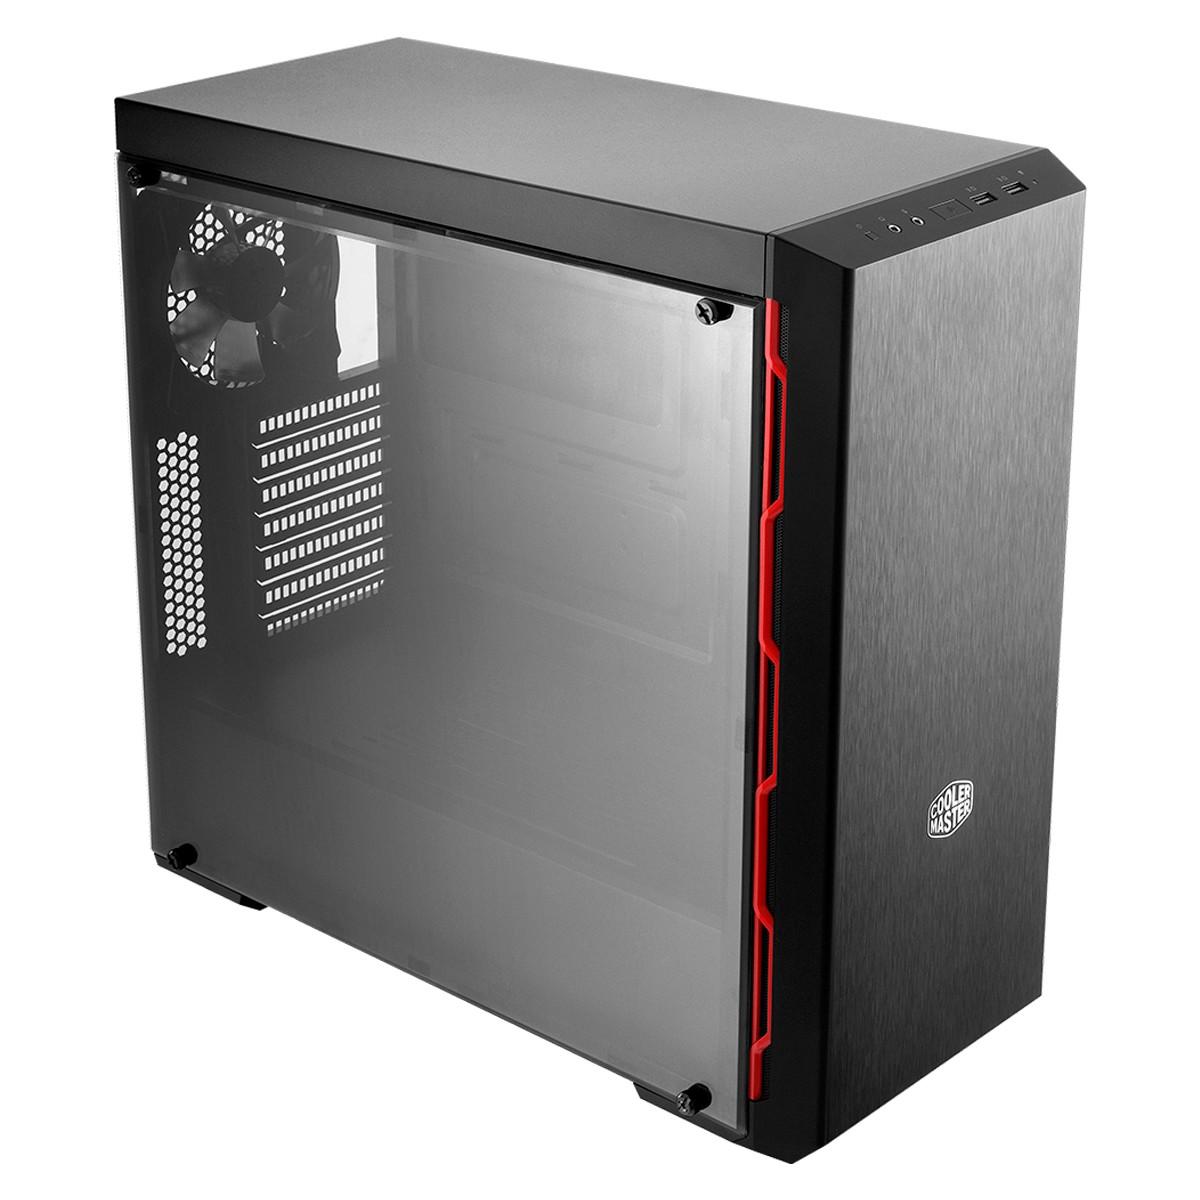 Gabinete Gamer Cooler Master MasterBox MB600L 1 Fan Preto e Vermelho - MCB-B600L-KA5N-S00